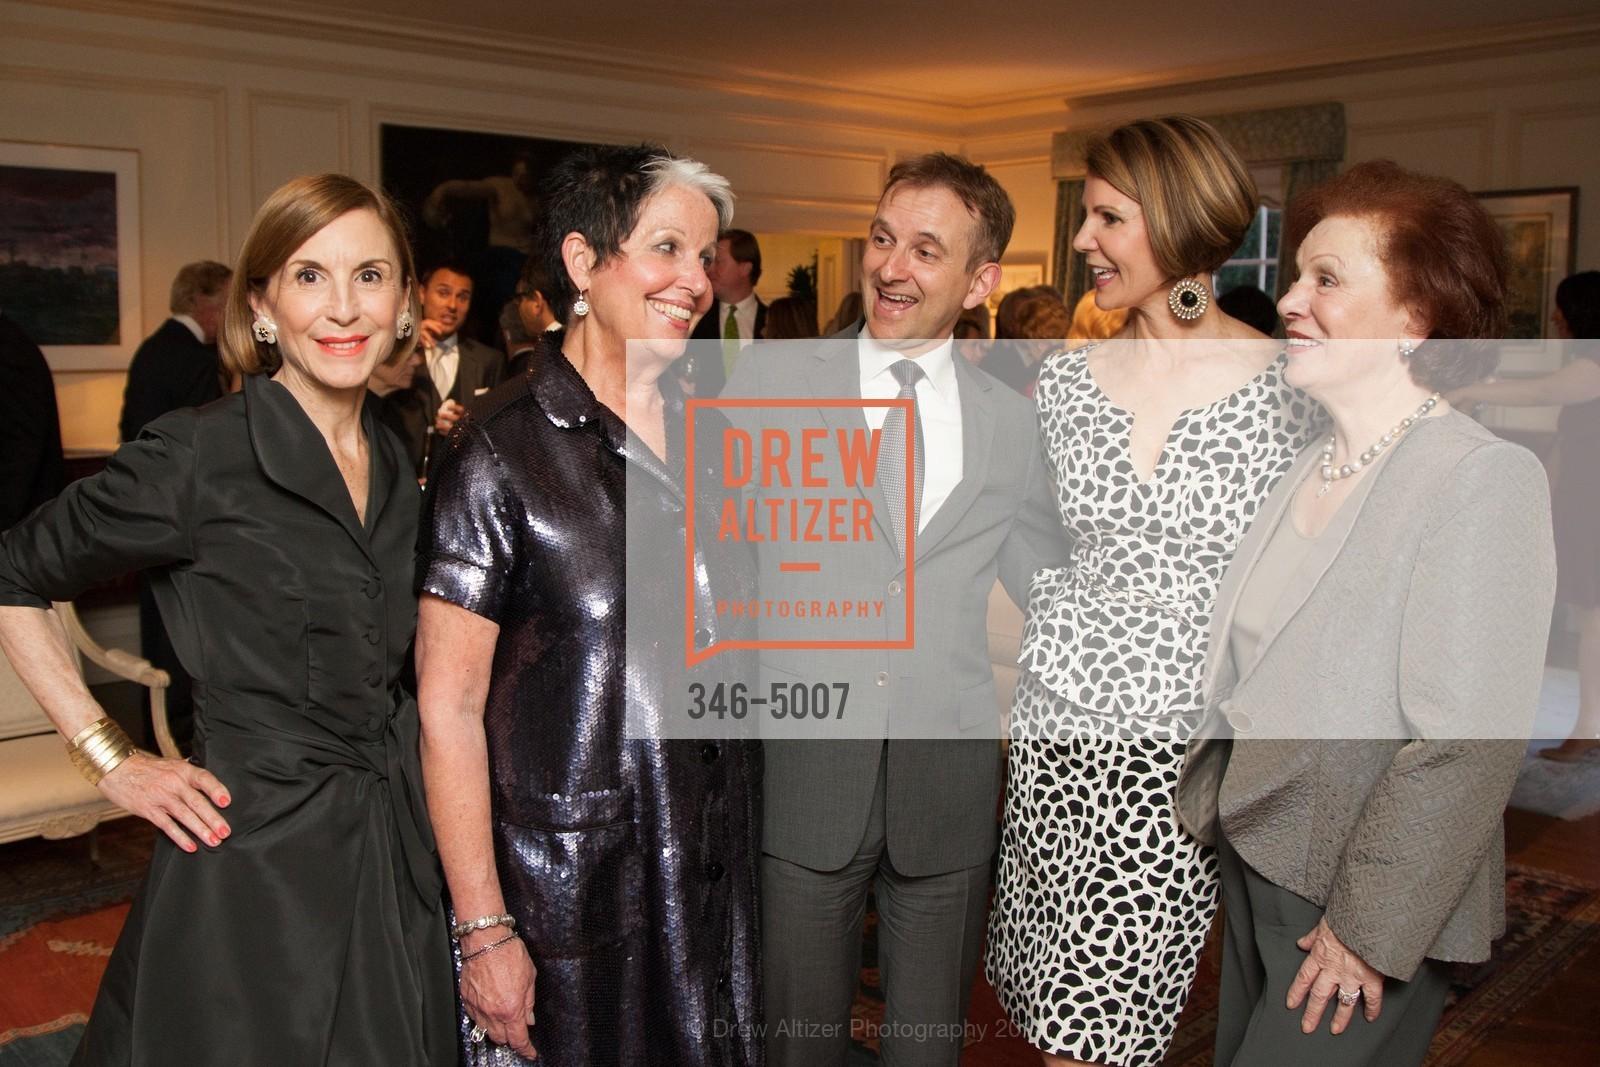 Marsha Monro, Karen Kubin, Mauro Battocchi, Katie Jarman, Romana Bracco, Photo #346-5007